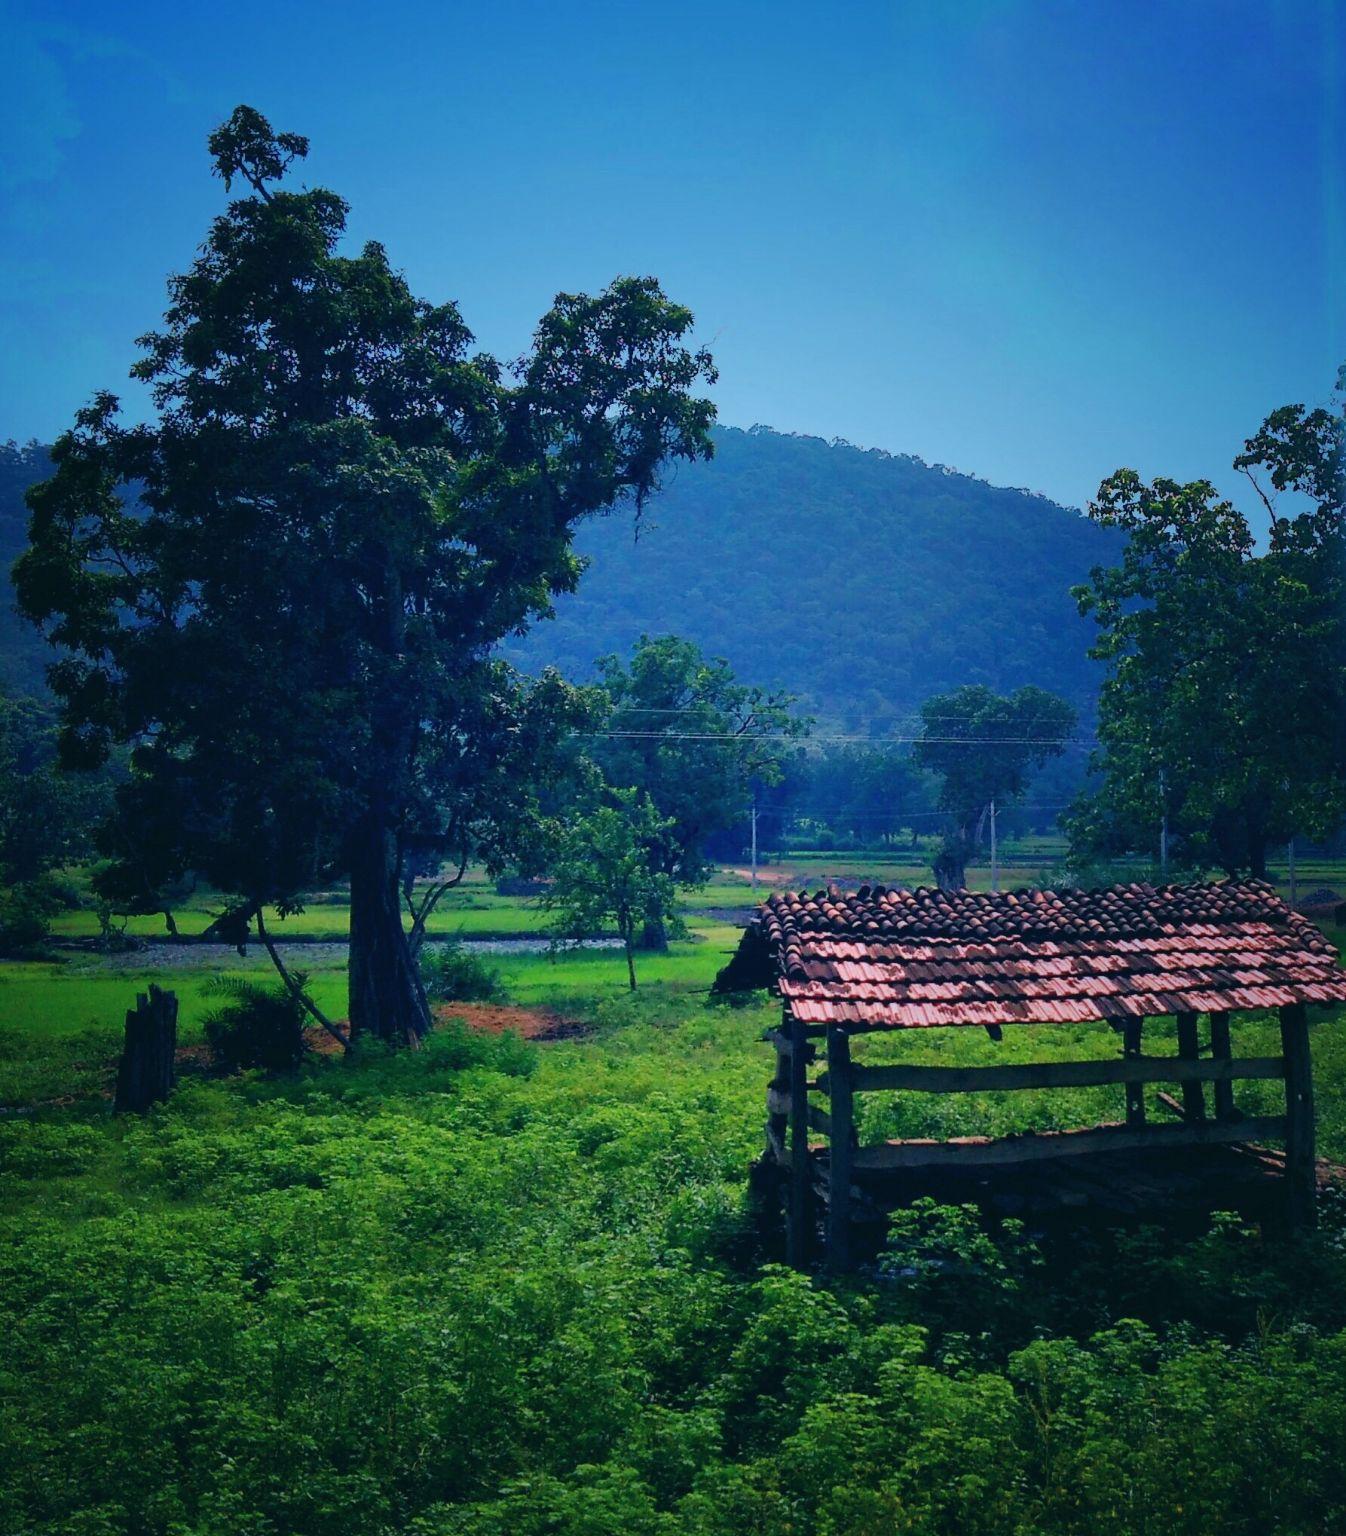 Photo of Chandrapur By Aswini kumar Biswal